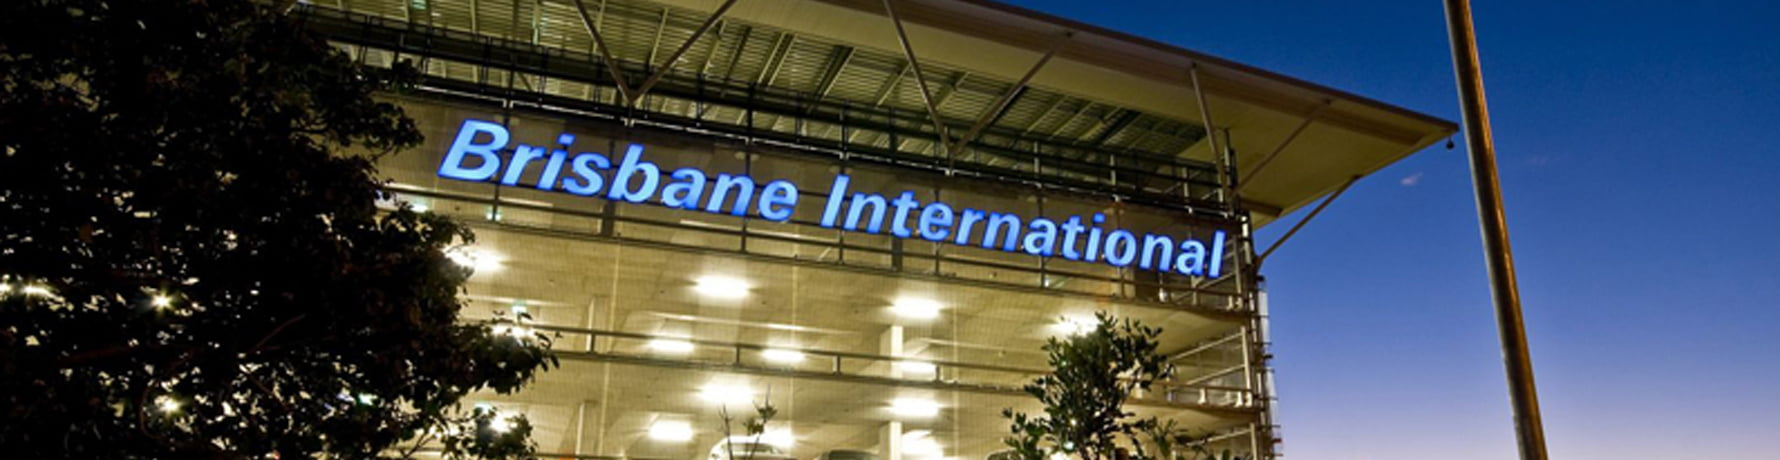 Aeropuerto y Aduana en Brisbane - Australia